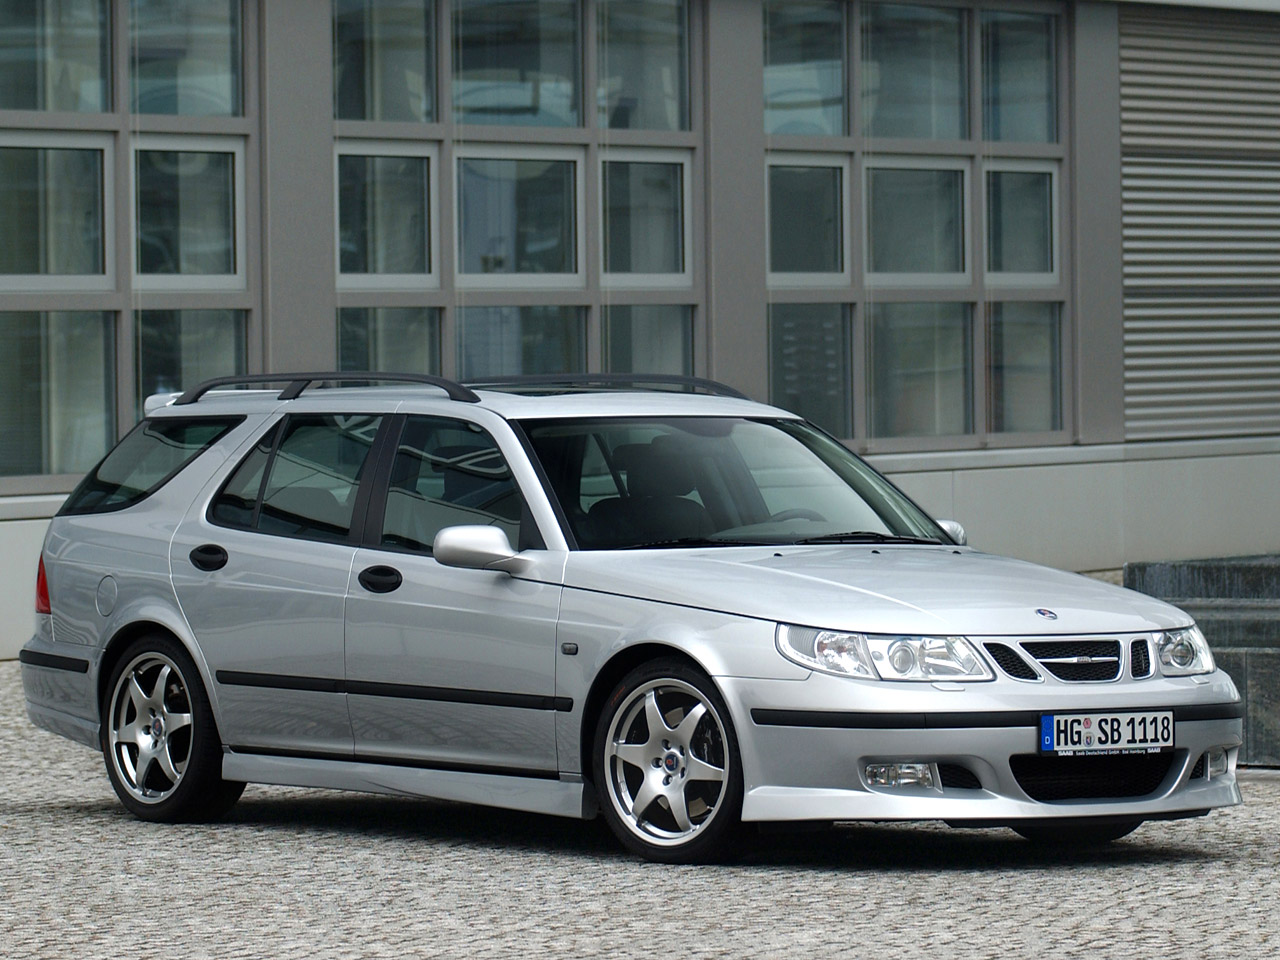 Hirsch_Performance-Saab_9_5_Wagon_Aero_m